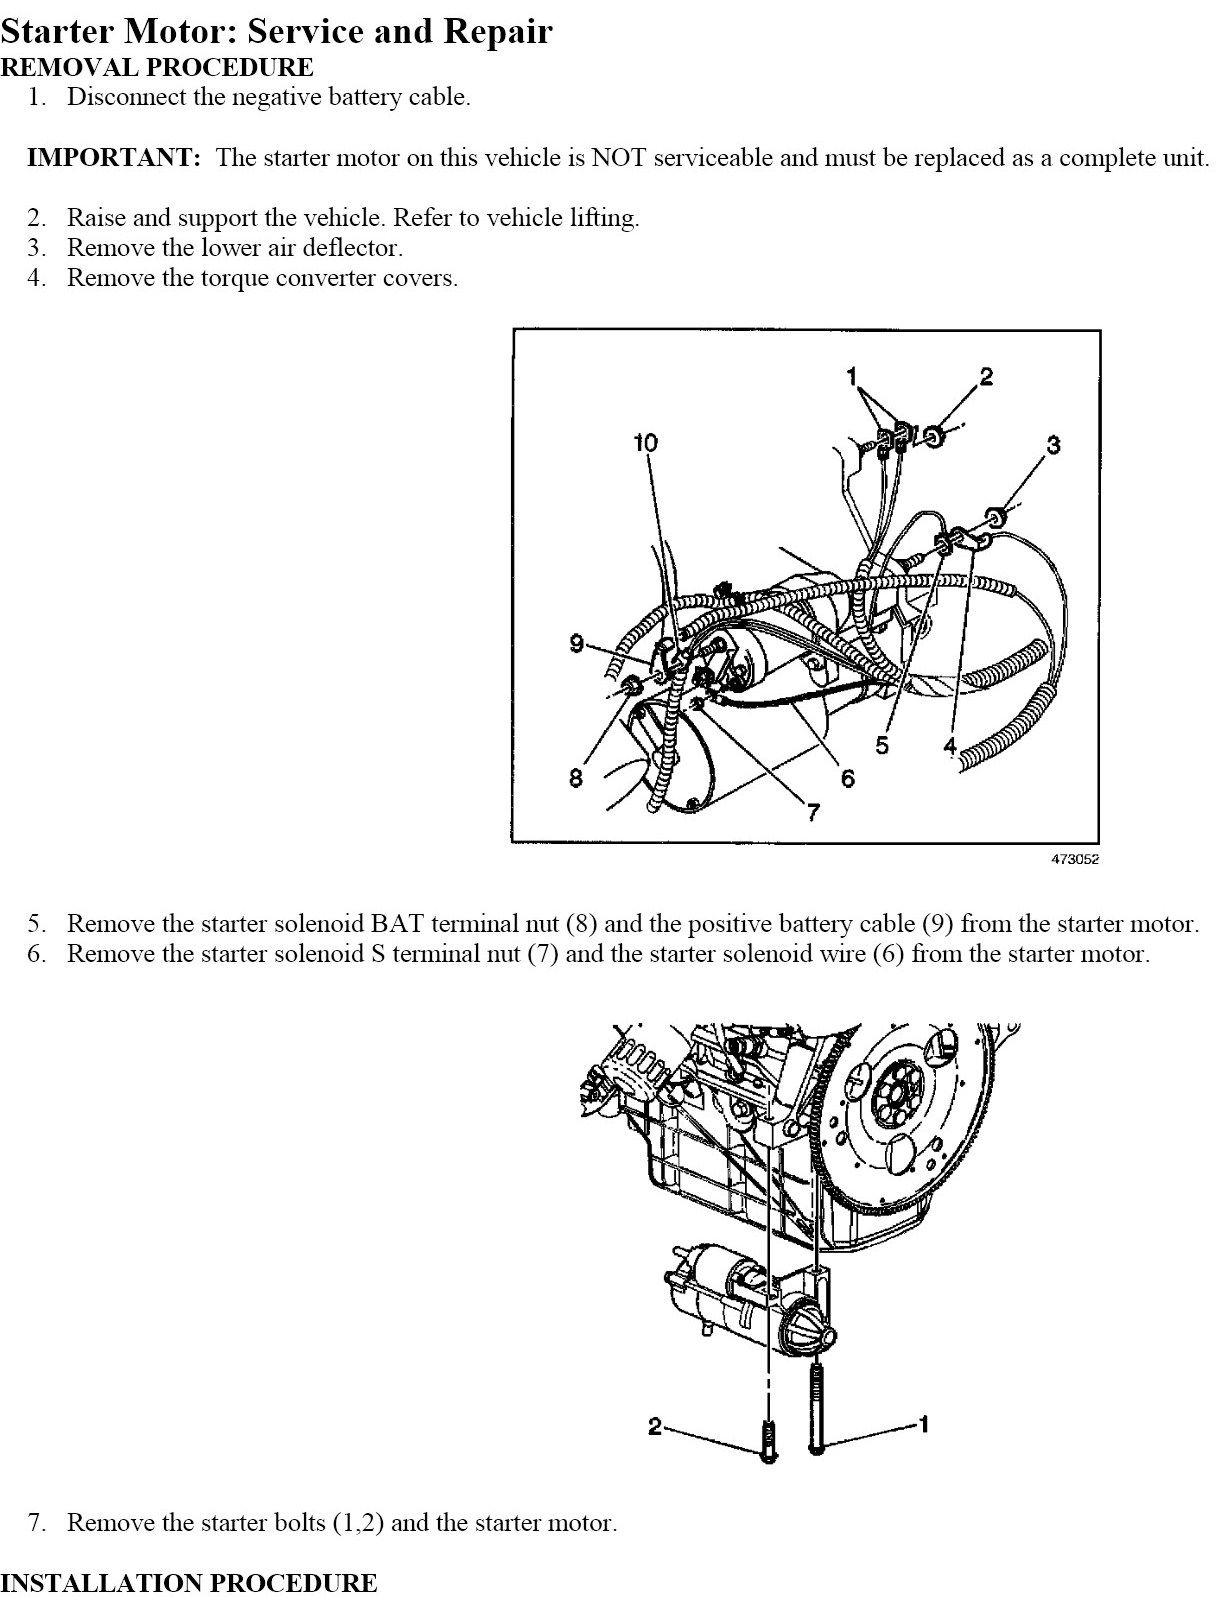 44 Best Of 2004 Chevy Impala Starter Wiring Diagram Chevy Impala Impala 2004 Chevrolet Impala